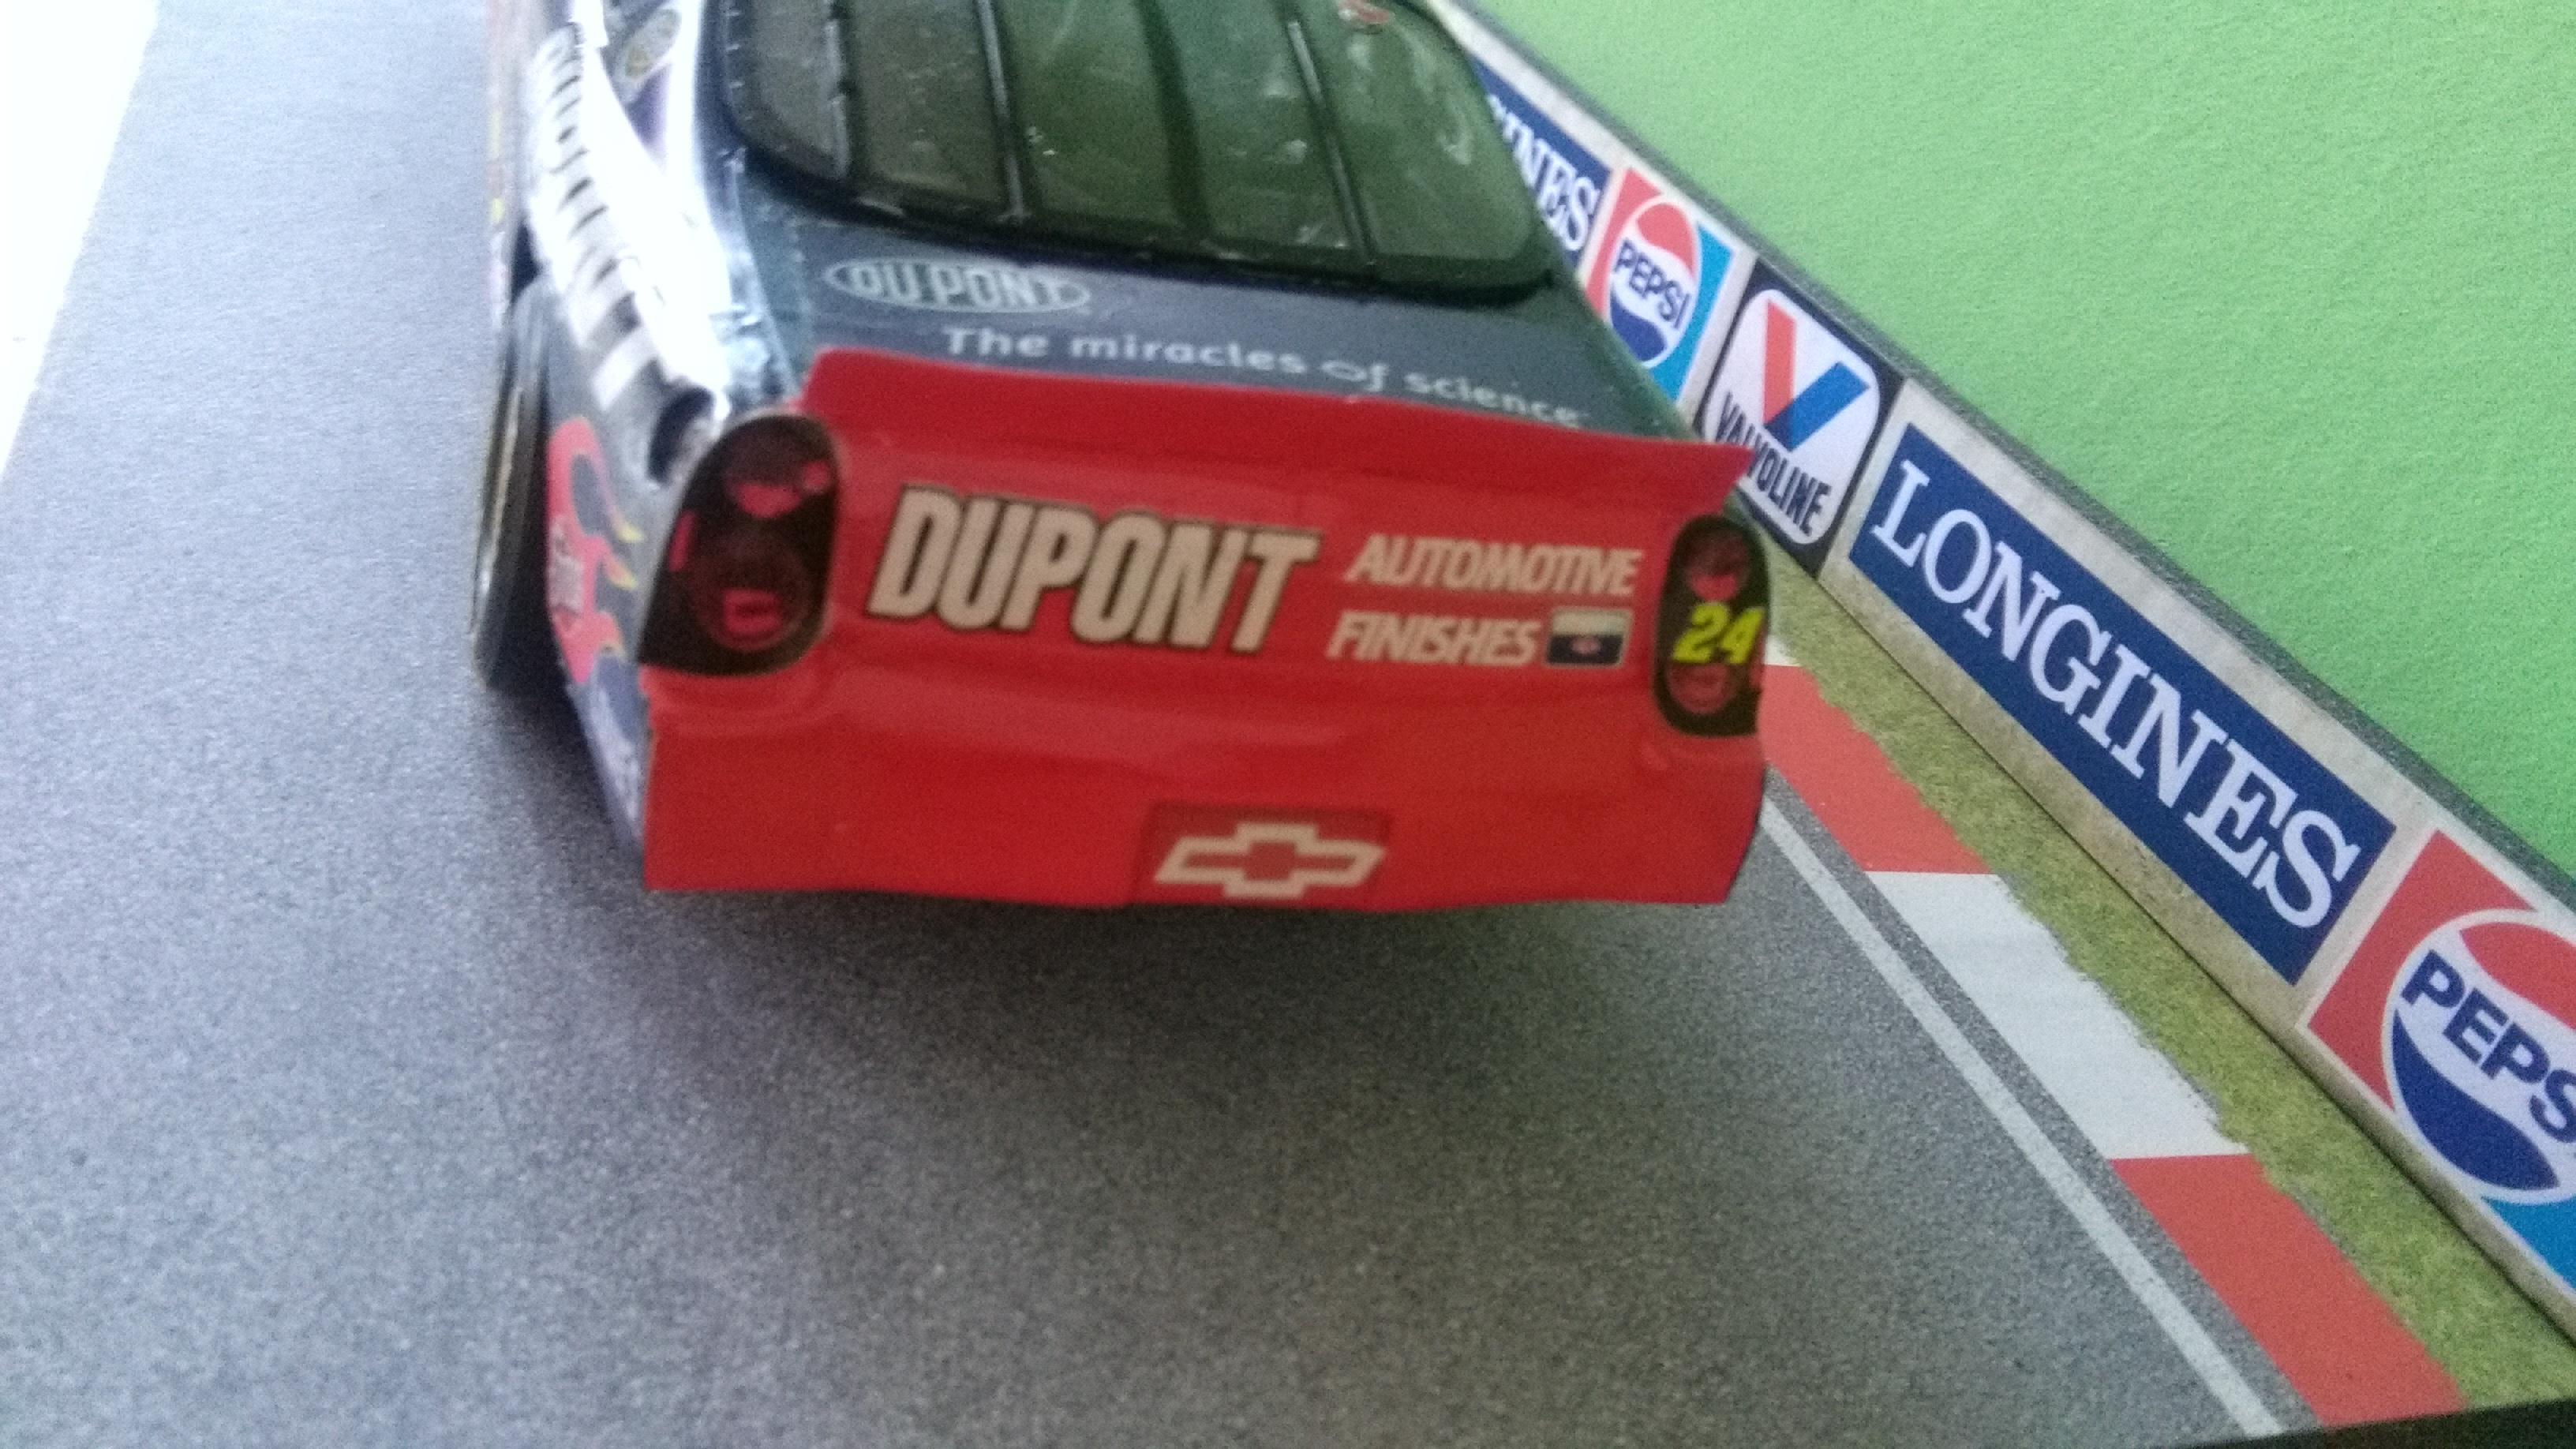 Chevy Monte-Carlo 2001 #24 Jeff Gordon Las Vegas win  324050IMG20171203141720